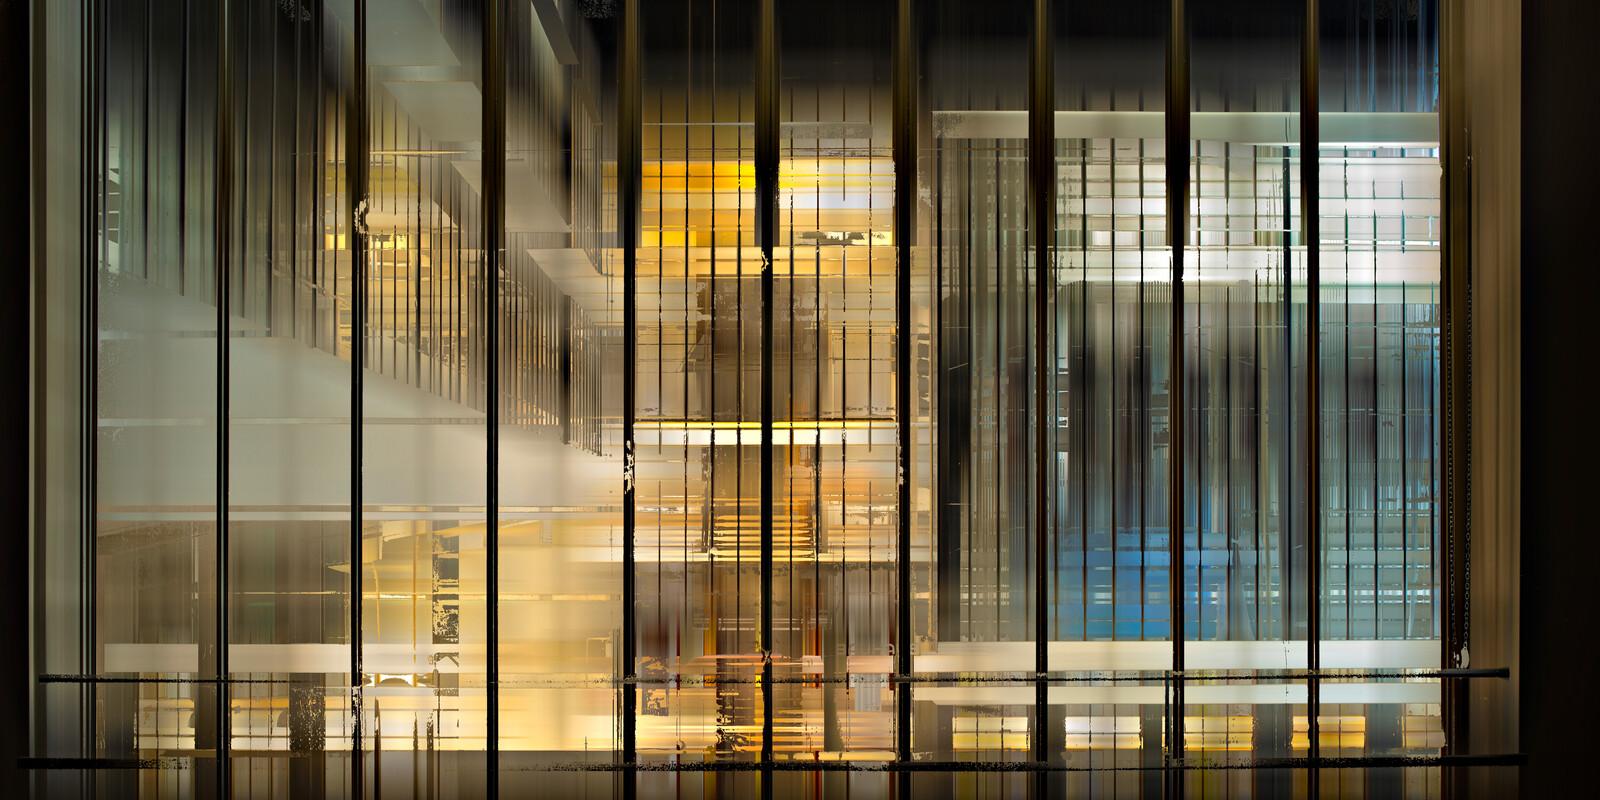 Bauhaus Dessau I - Sabine Wild